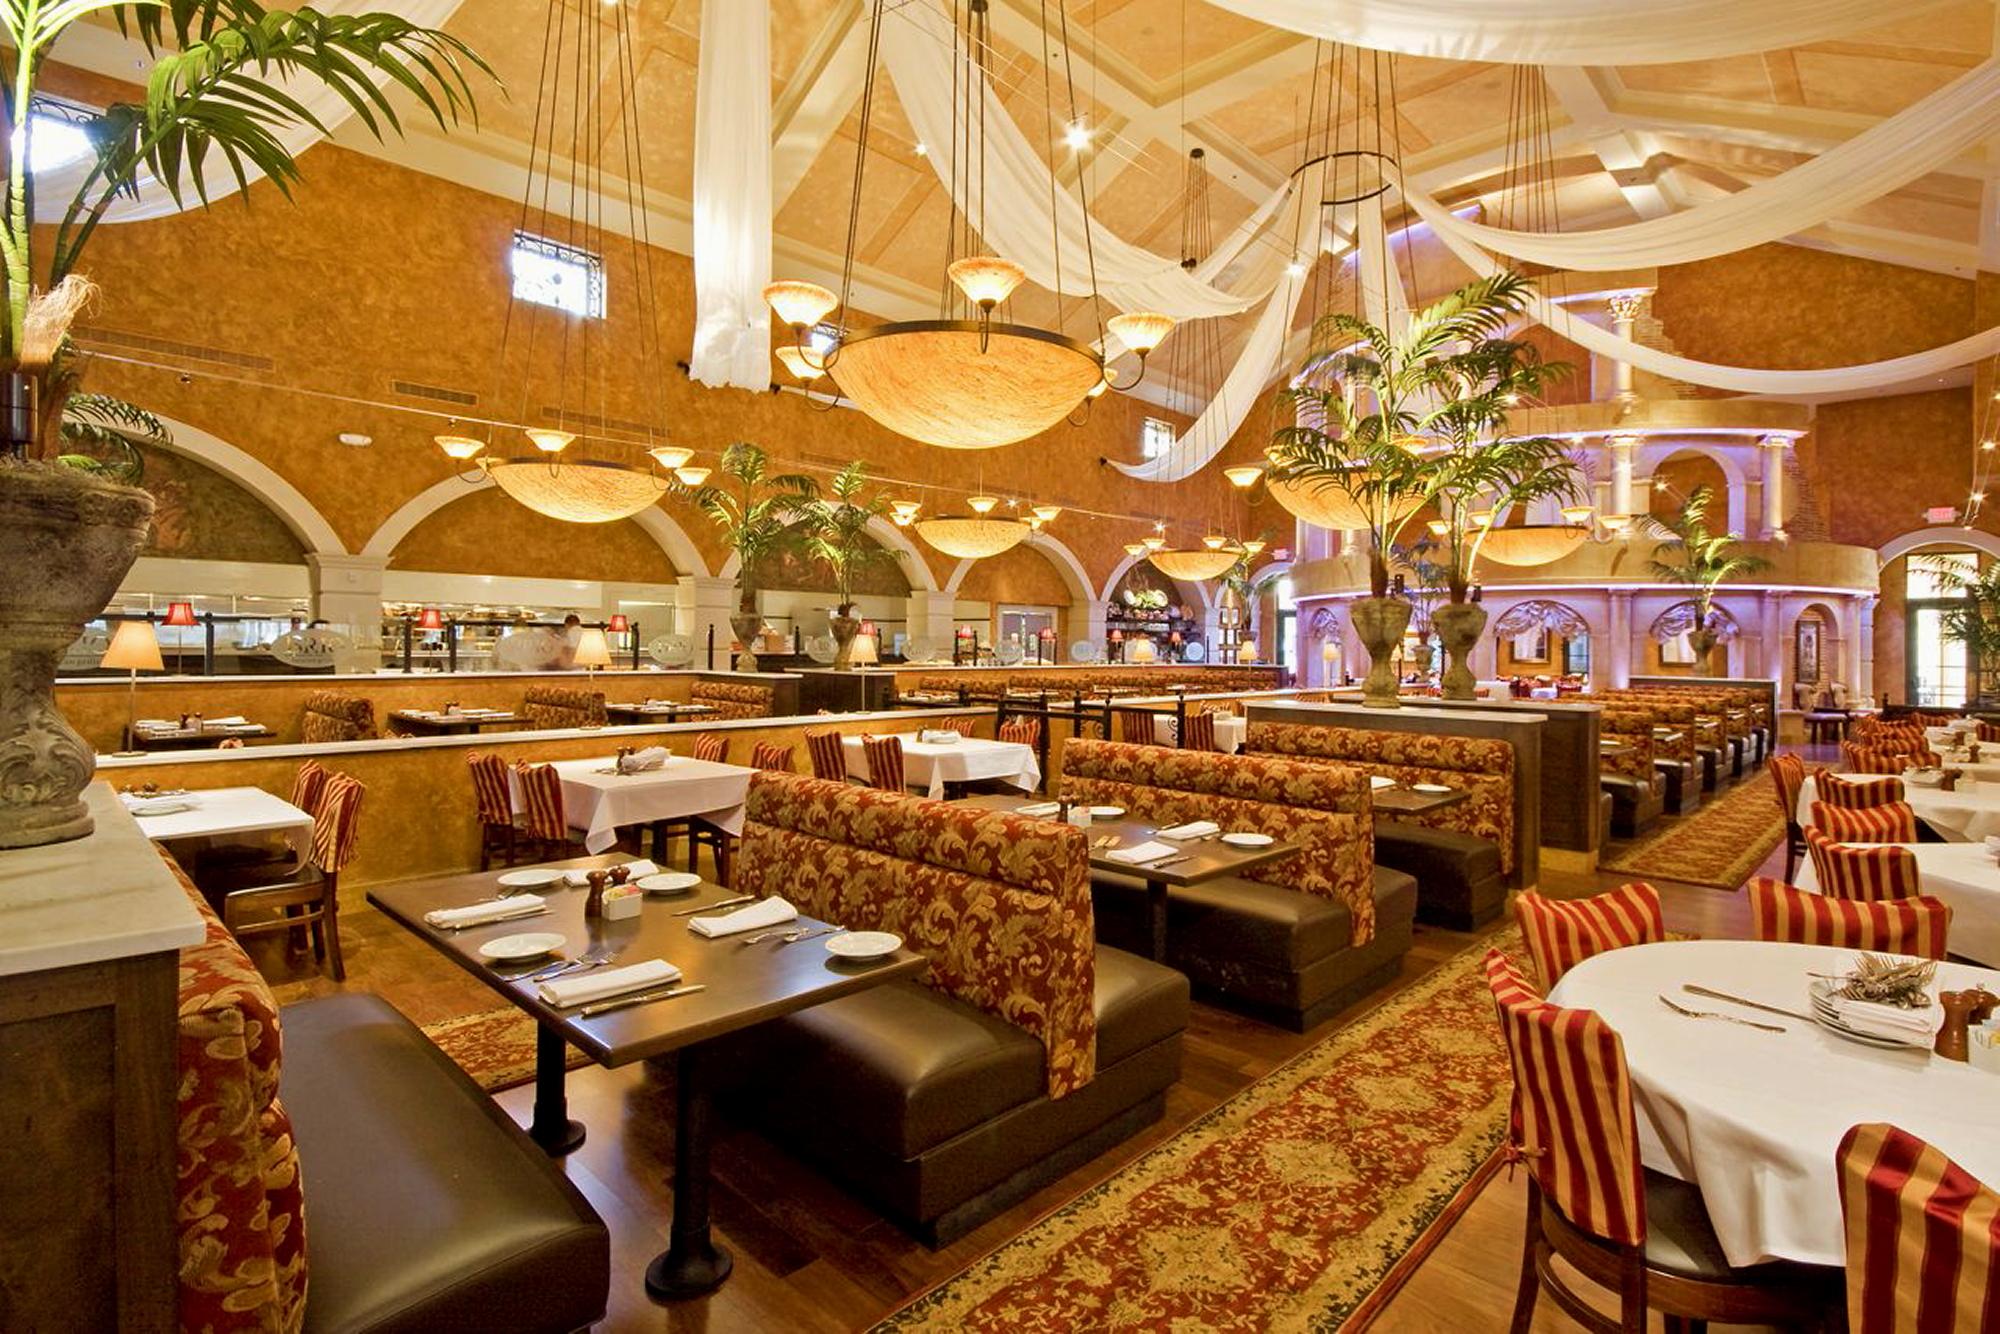 Hospitality Brio Bravo Restaurants Tec Inc